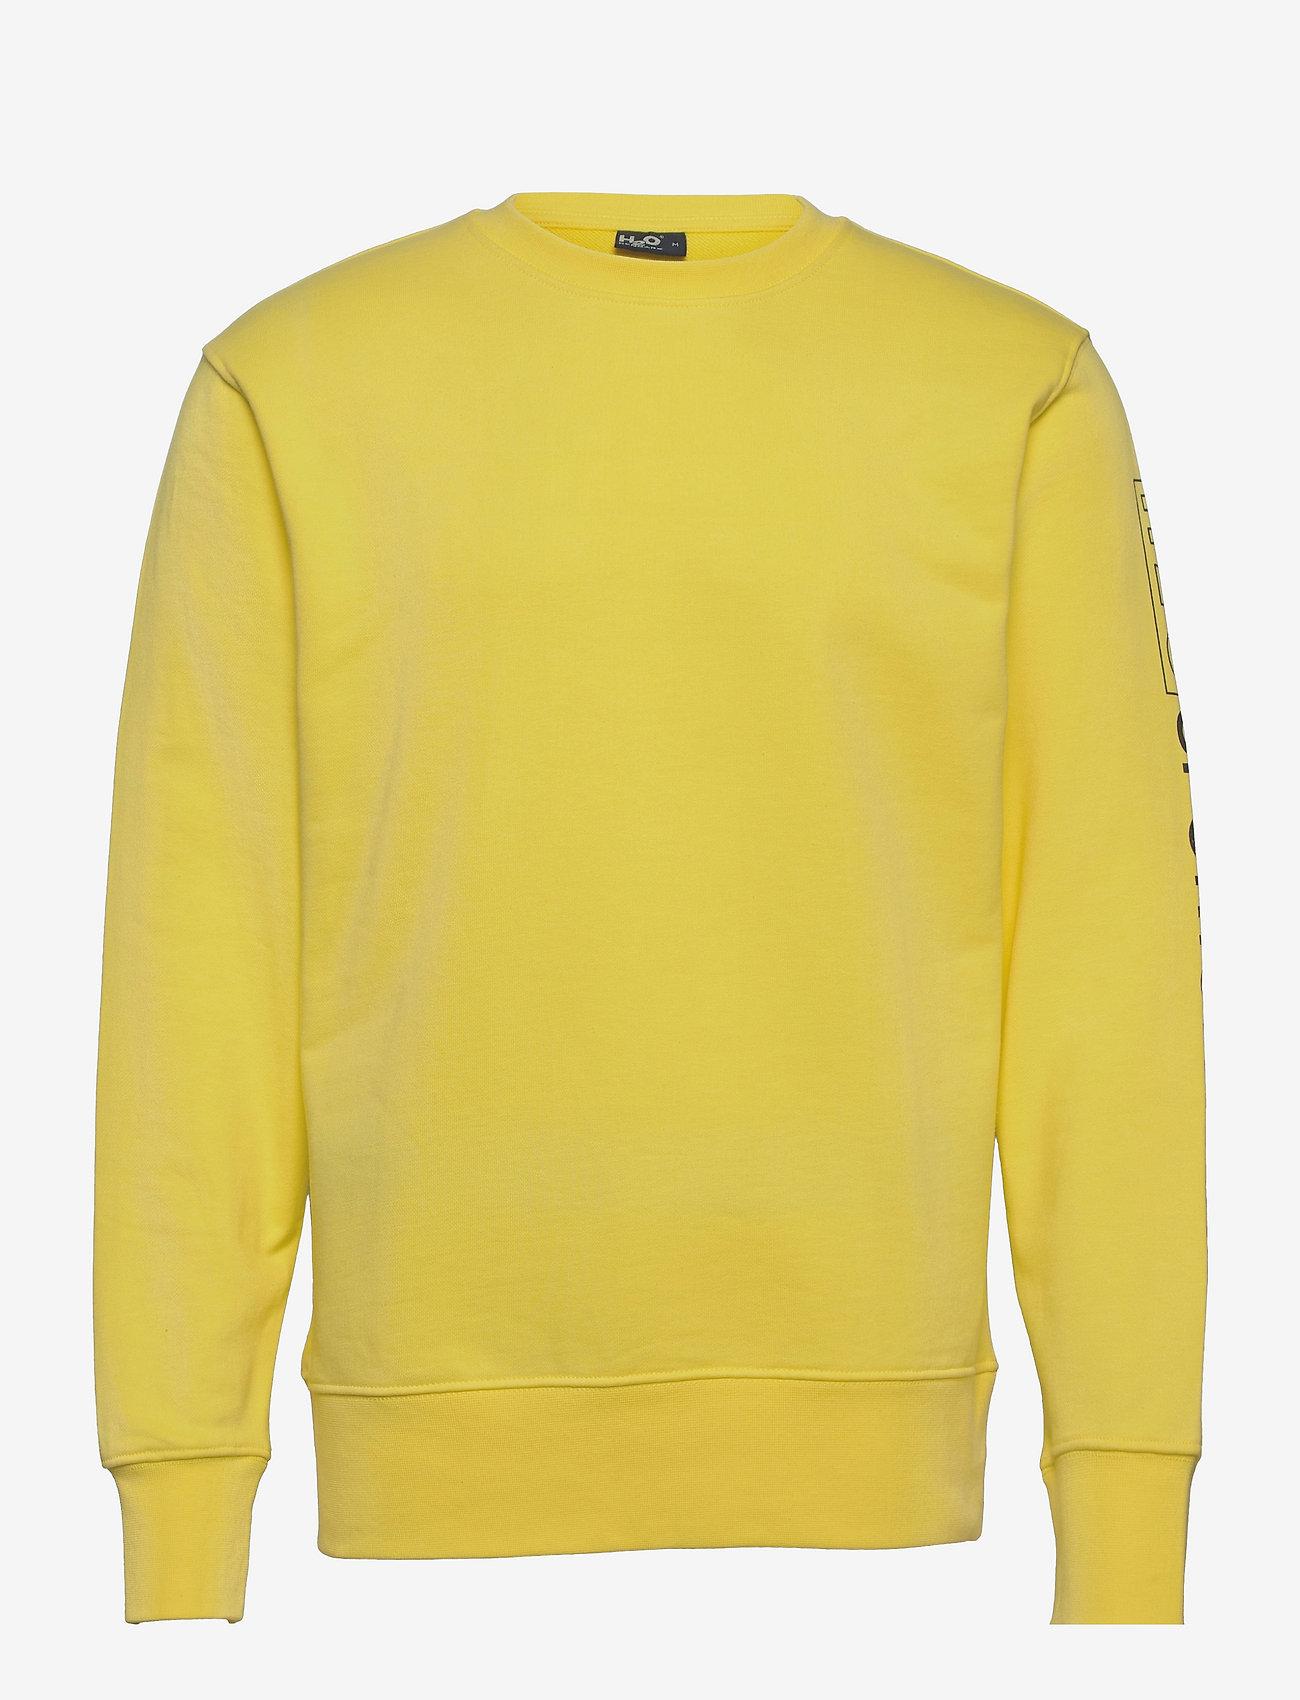 H2O - Anholt Sweat O'neck - yläosat - light yellow - 0